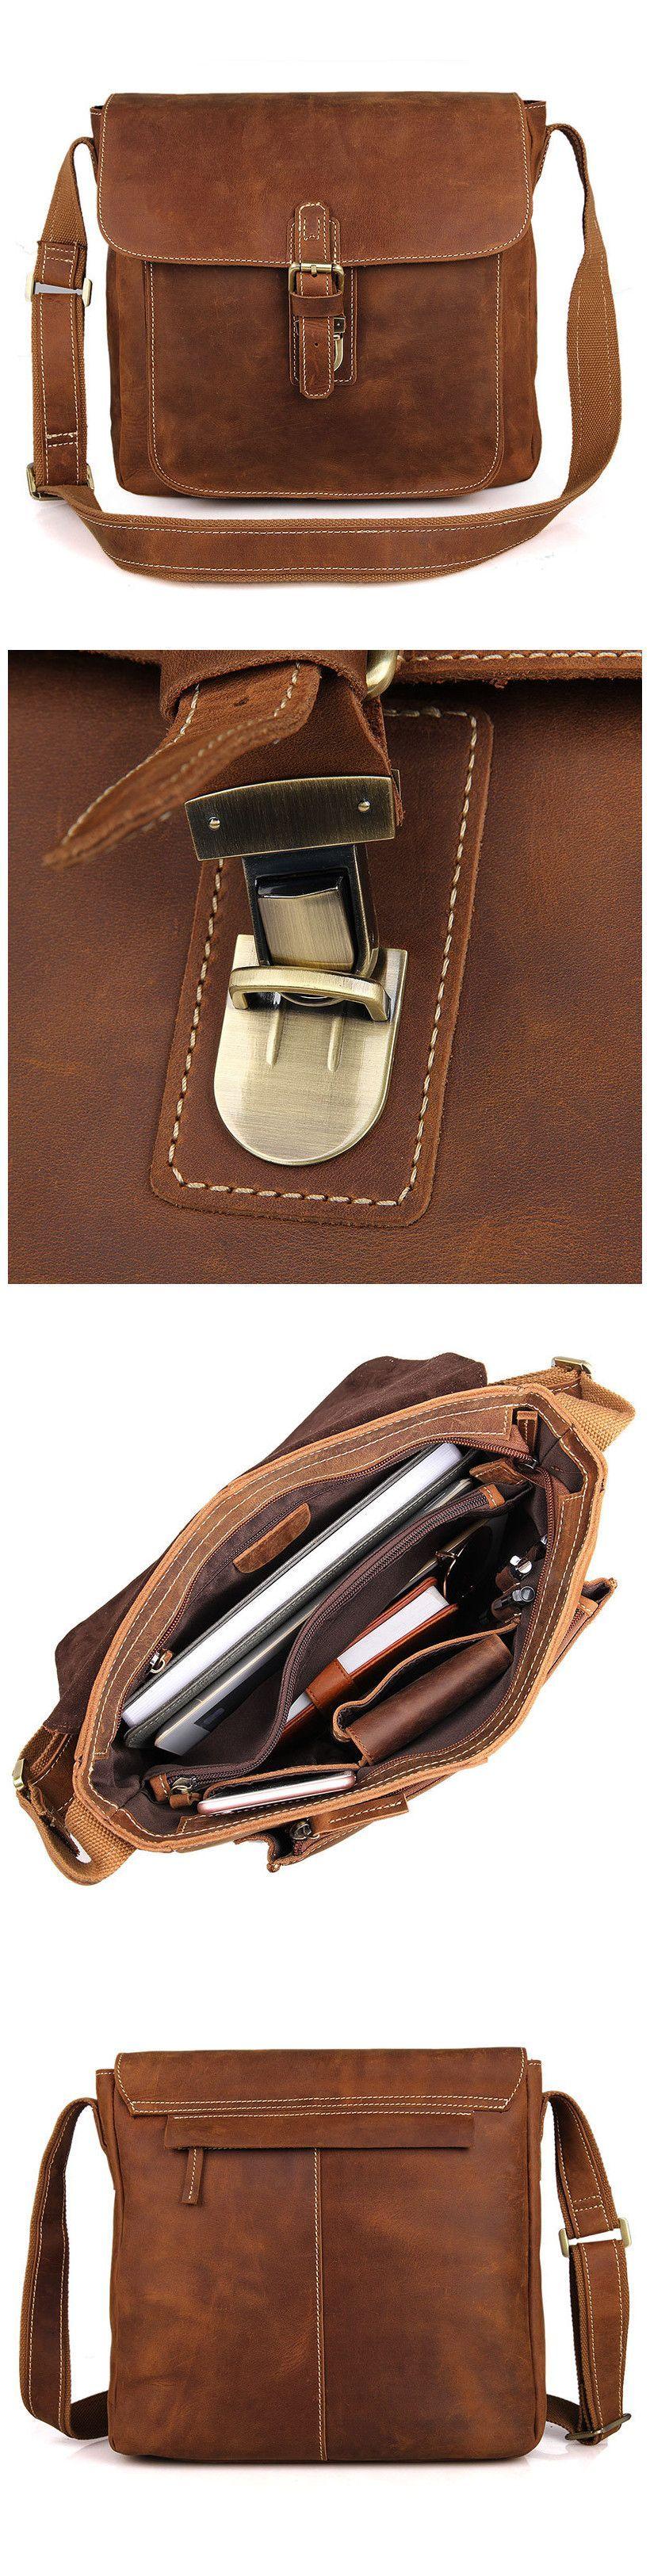 380dee598bce Handmade Crazy Horse Leather Messenger Bags Men s Vintage Shoulder Bags  Cross Body Bag